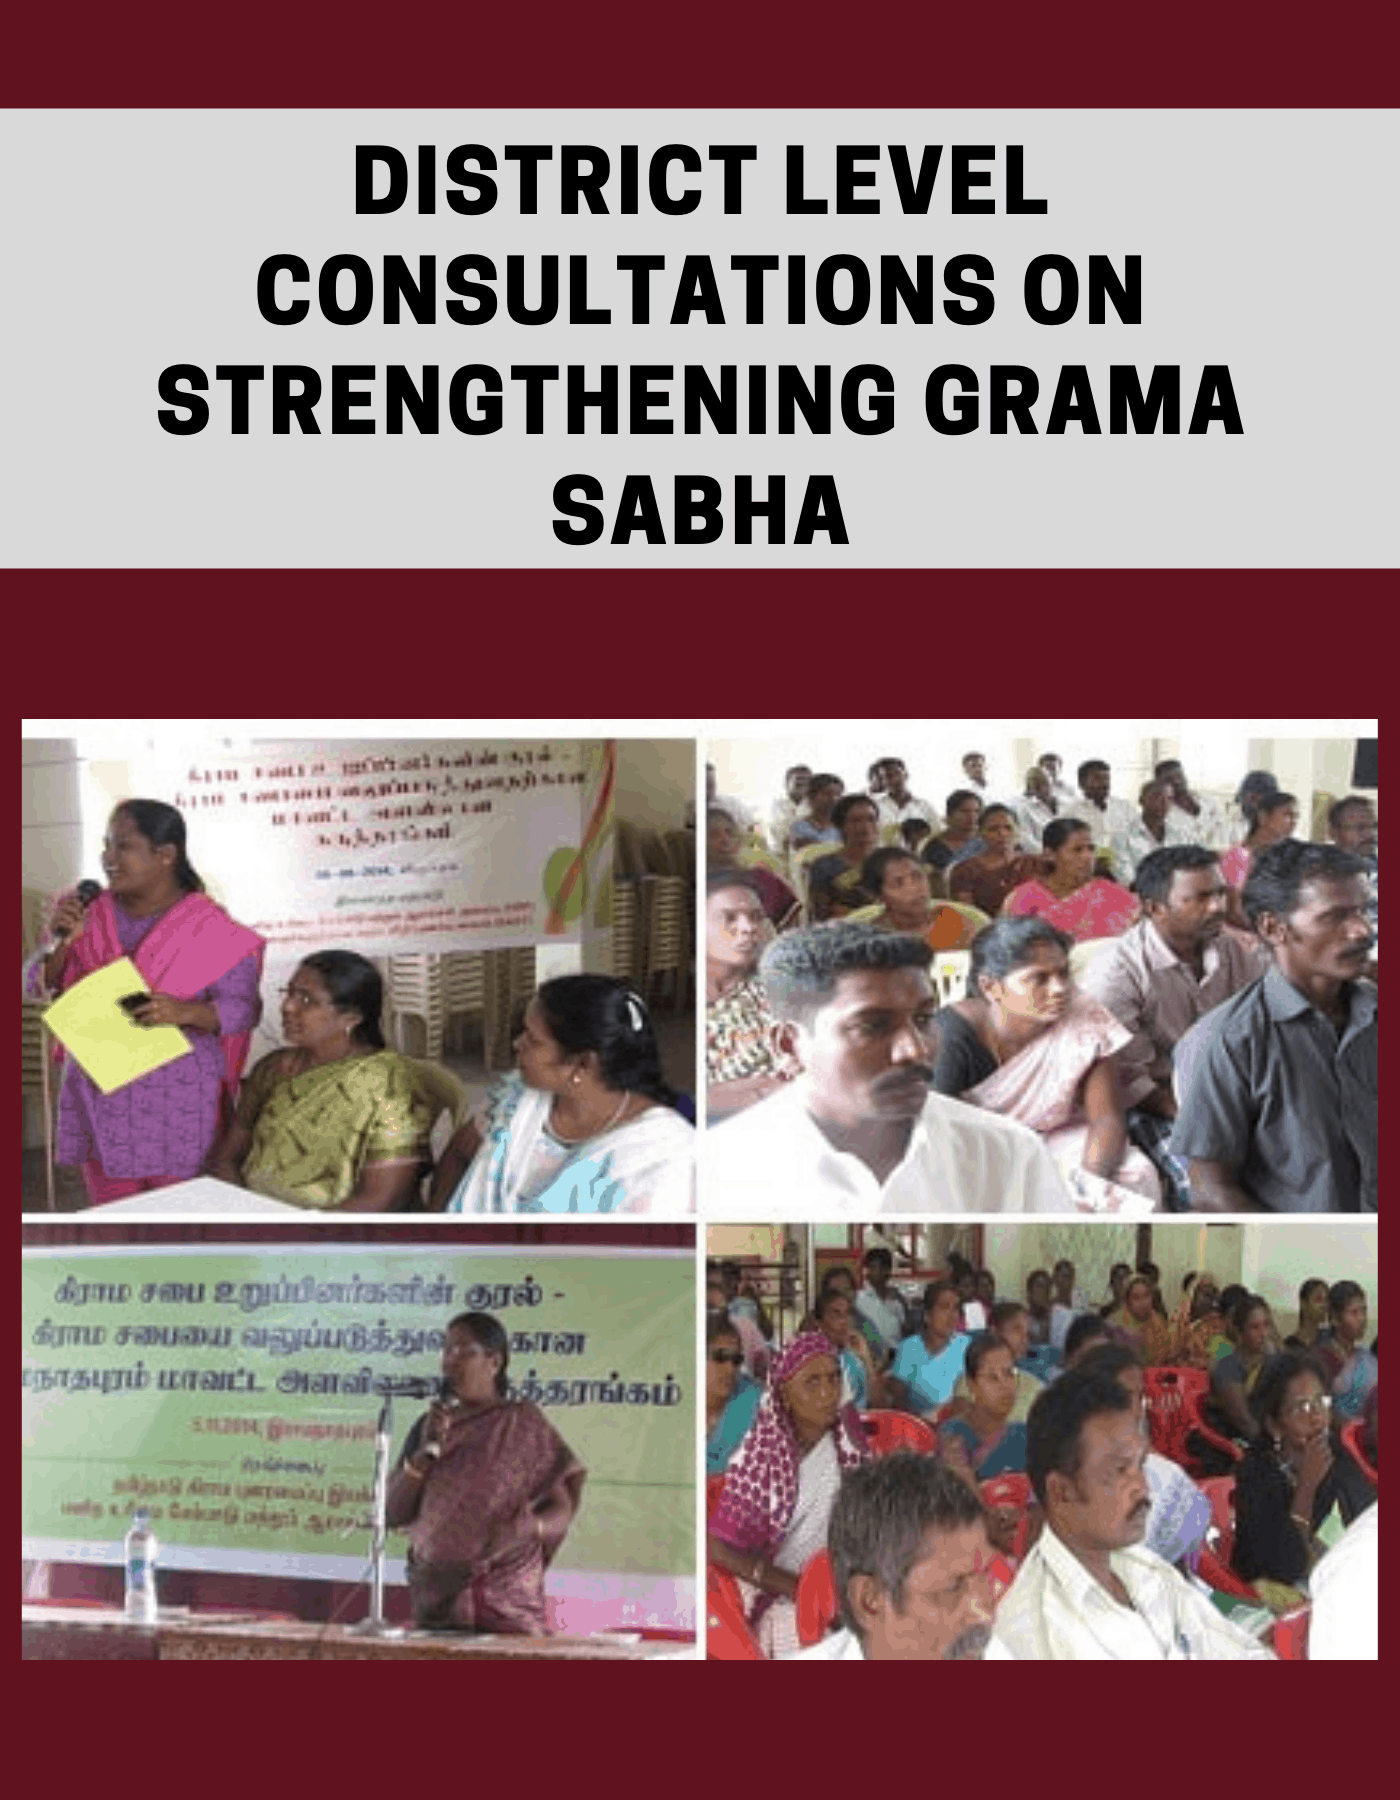 District Level Consultations on Strengthening Grama Sabha